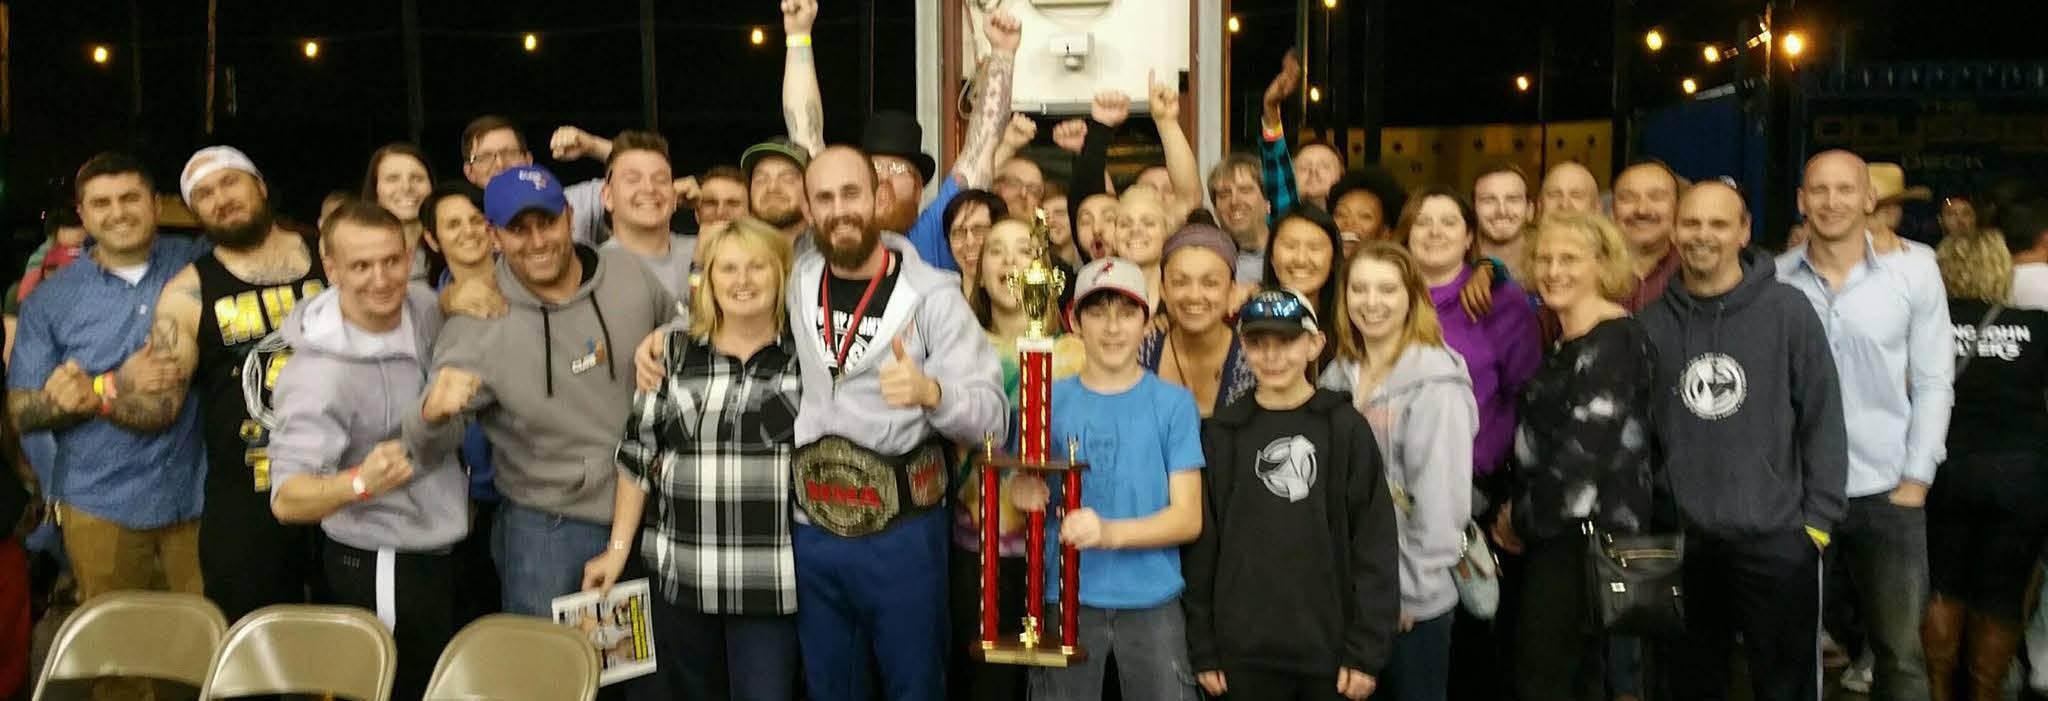 club mma mixed martial arts for all ages cincinnati ohio